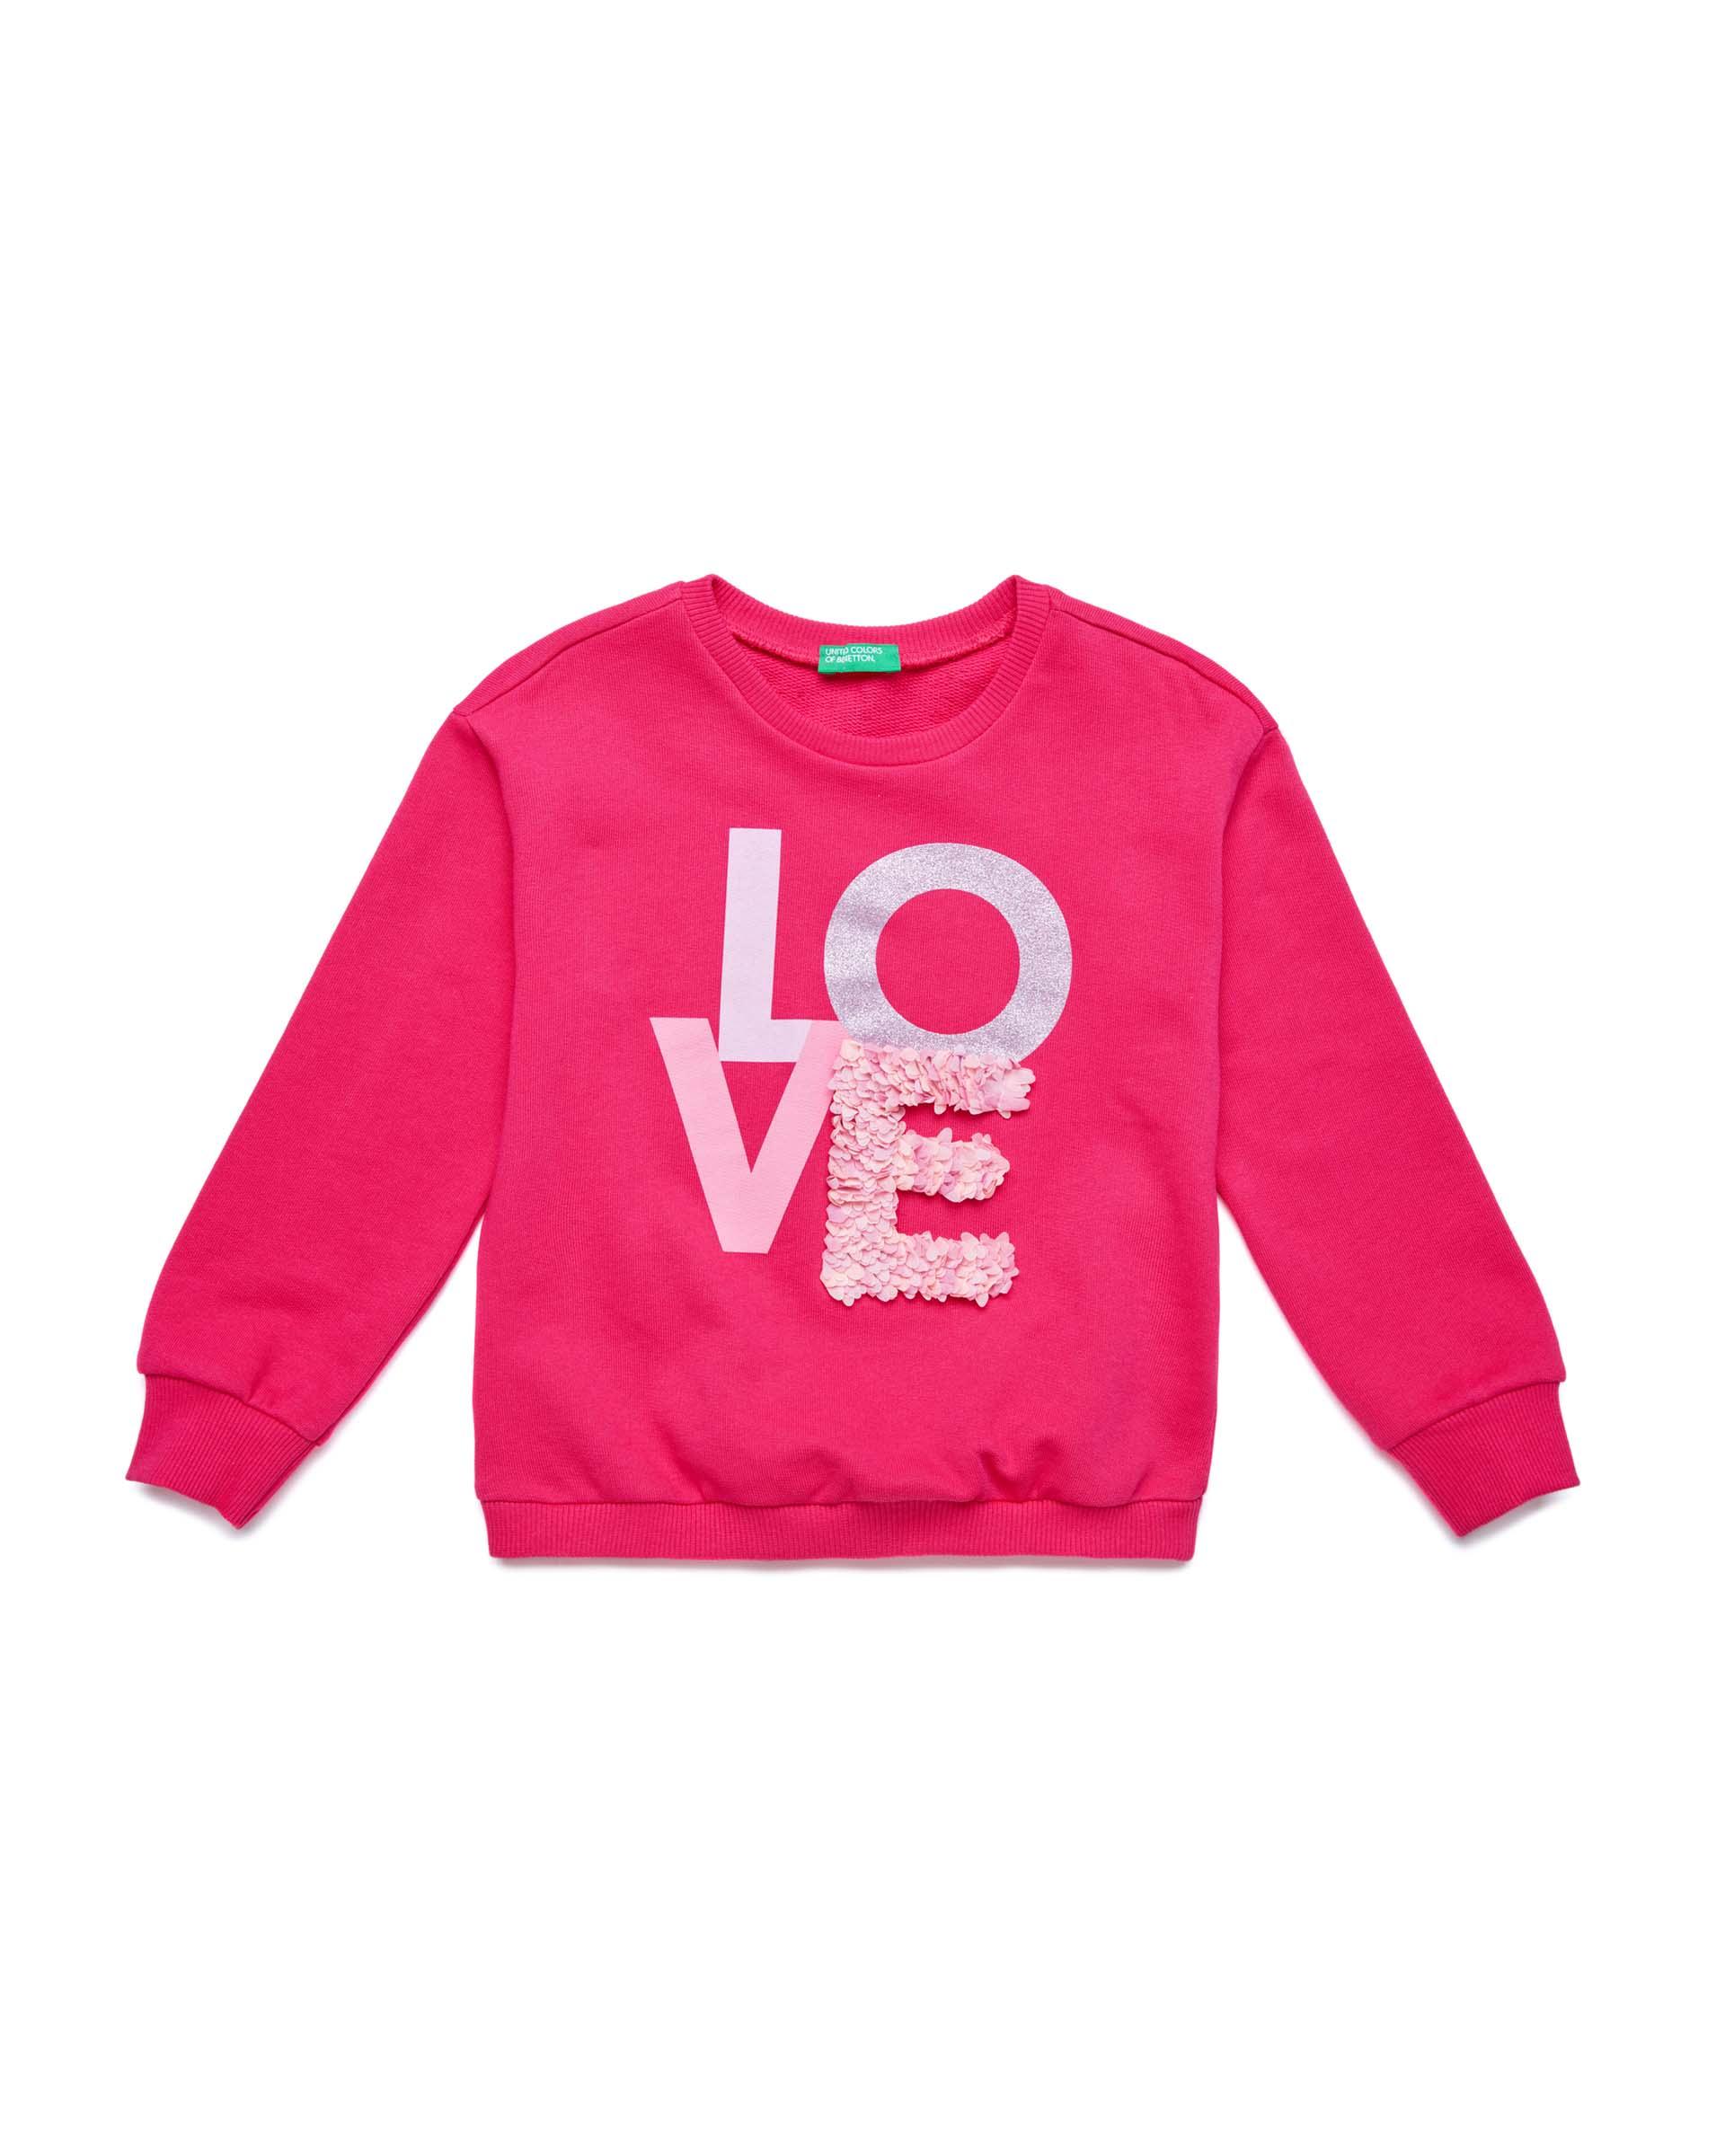 Купить 20P_3J68C14L2_2L3, Толстовка для девочек Benetton 3J68C14L2_2L3 р-р 128, United Colors of Benetton, Толстовки для девочек